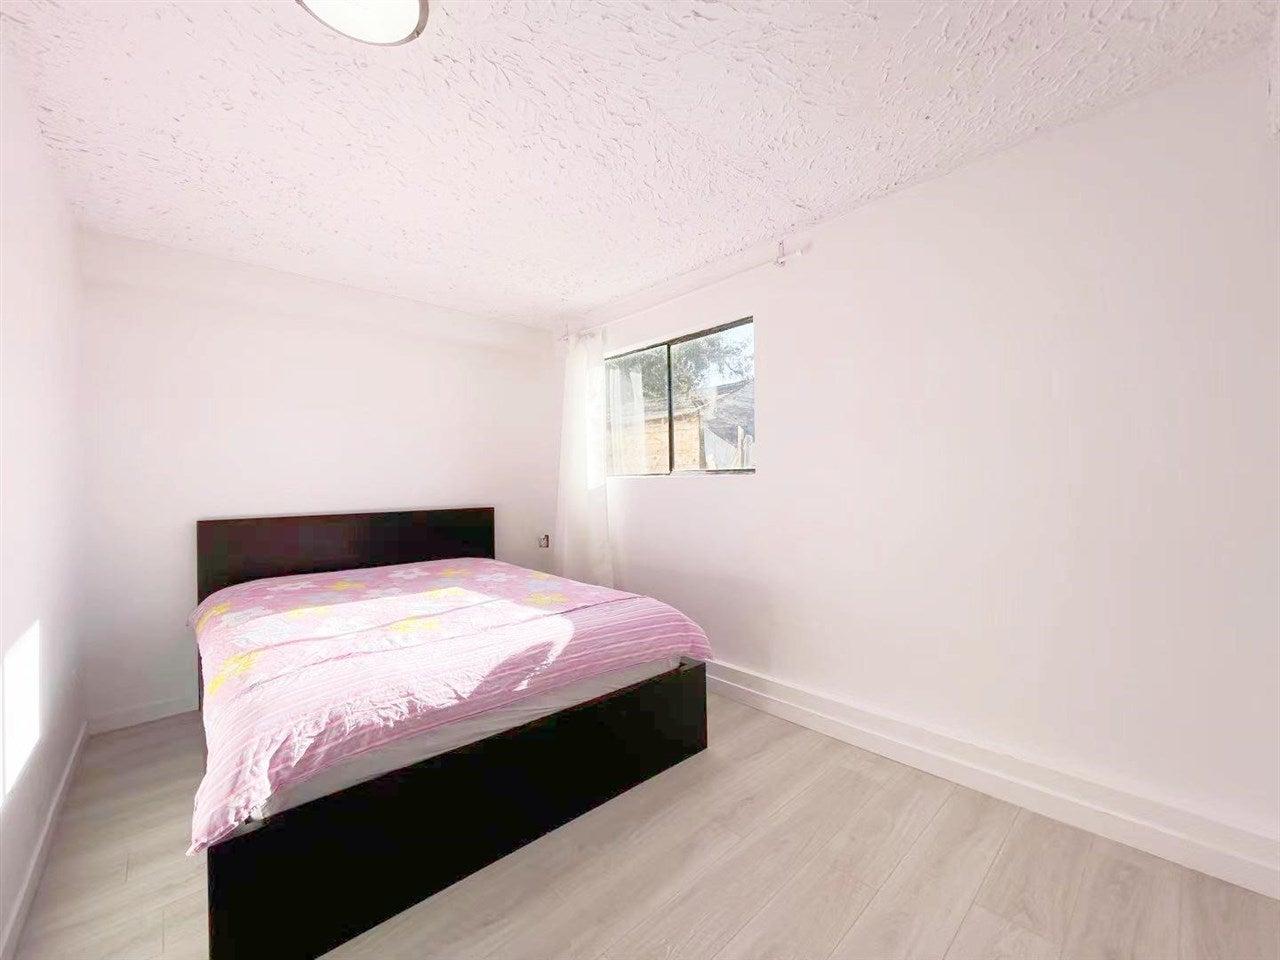 8991 ST. ALBANS ROAD - Garden City 1/2 Duplex for sale, 5 Bedrooms (R2576083) - #18